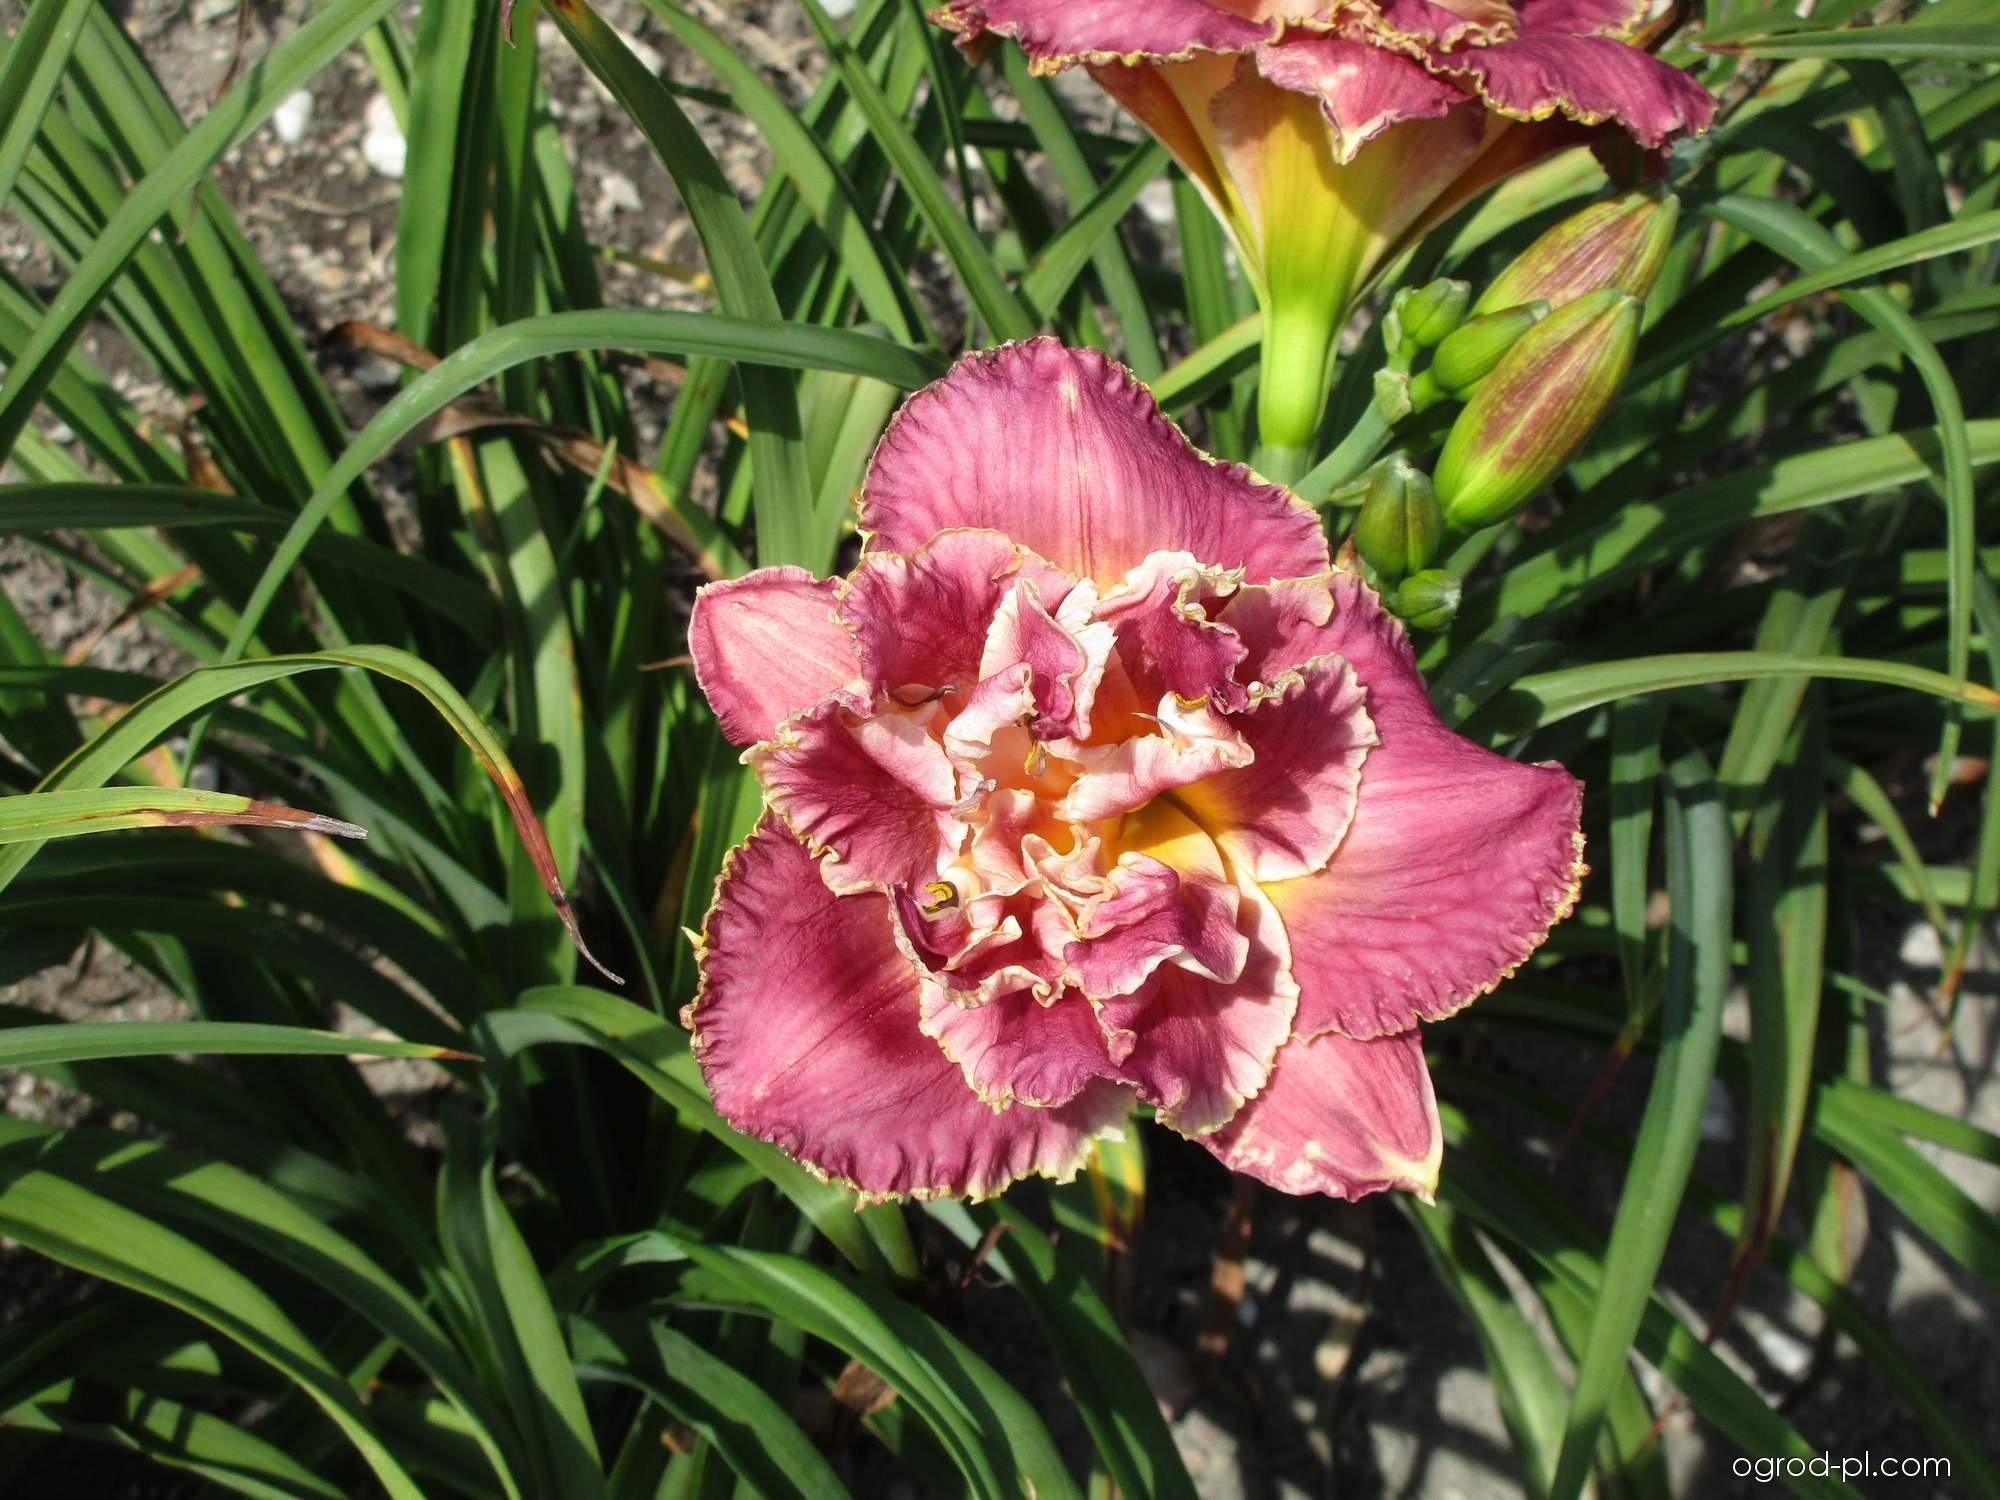 Liliowiec ogrodowy - Hemerocallis Emerie Baker